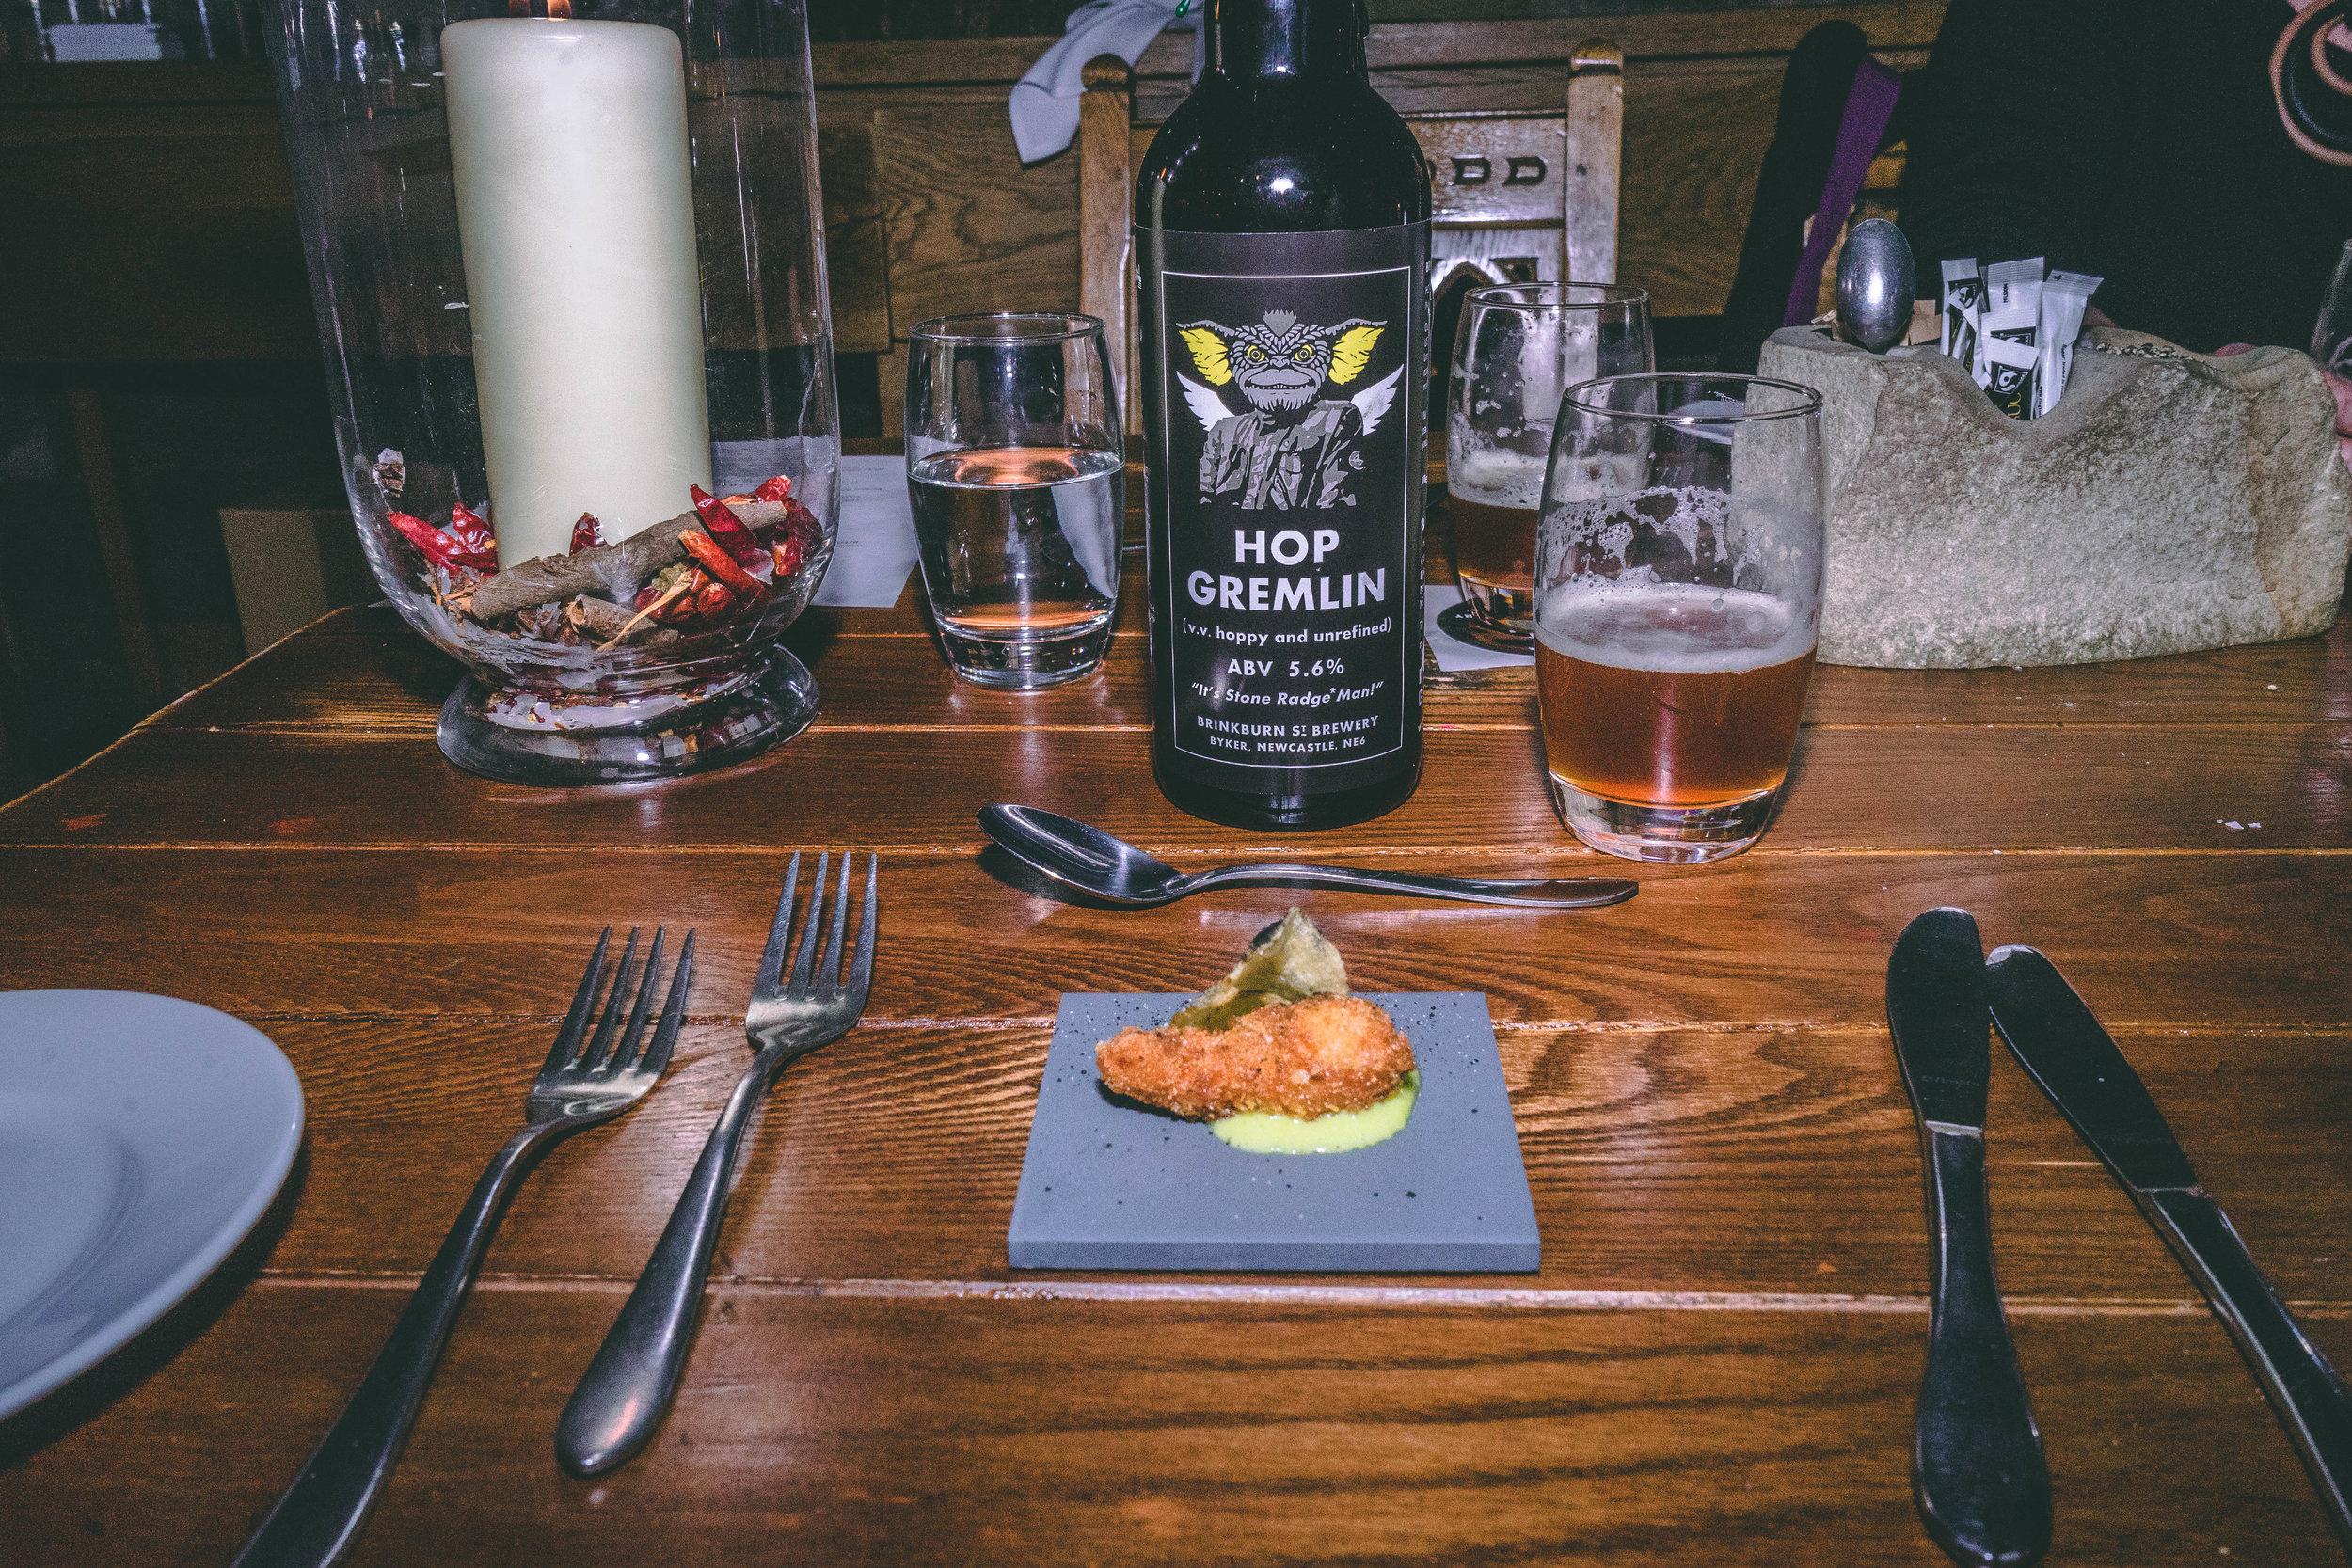 North Sea scampi, wasabi hollandaise & crispy potato with Hop Gremlin – 5.6%.jpg